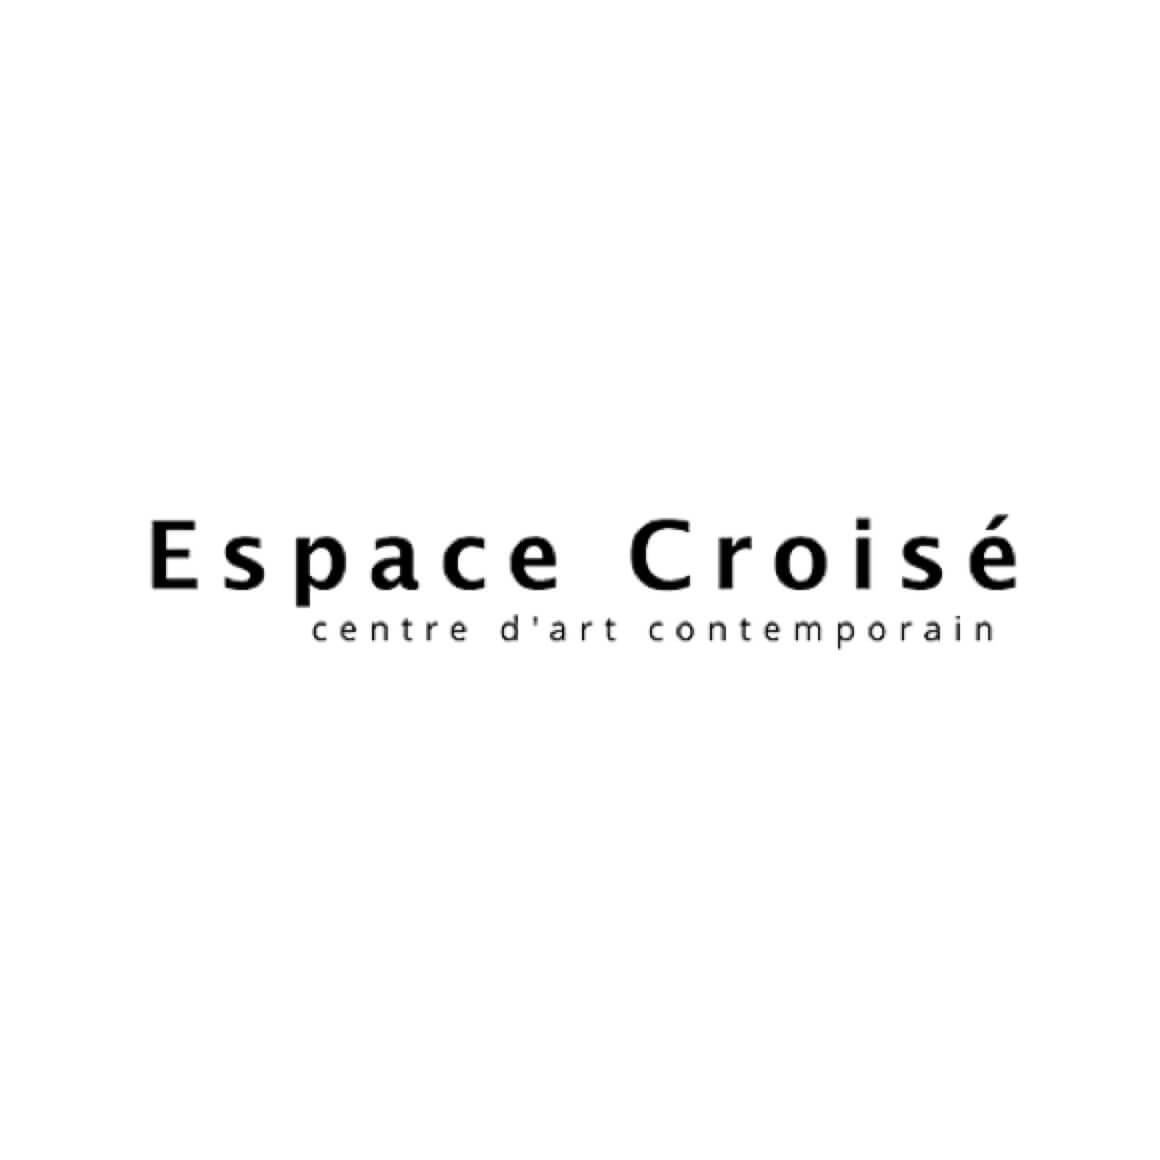 espace_croise